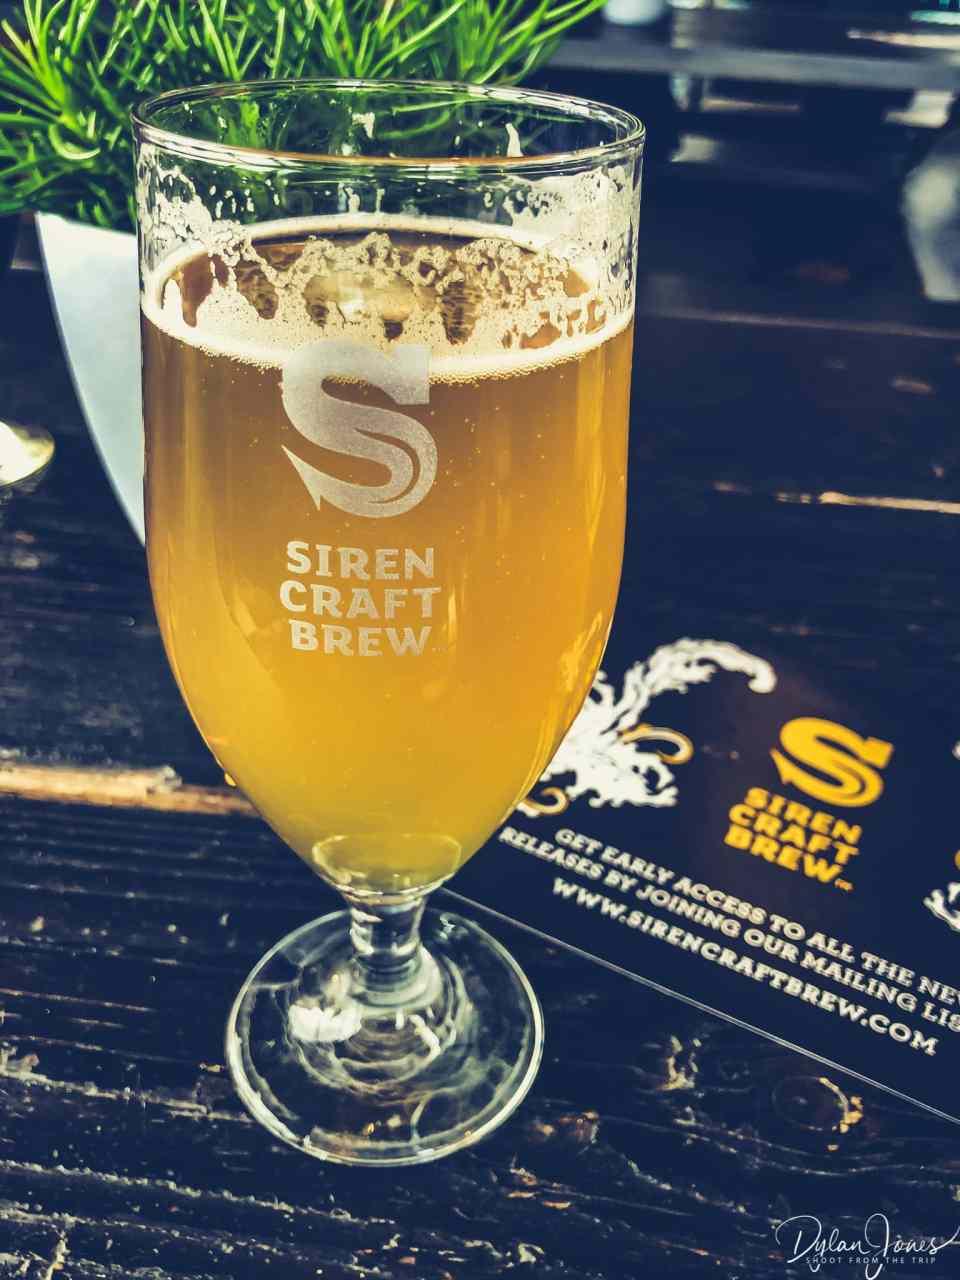 Sampling a Yulu at the Siren Craft Brewery